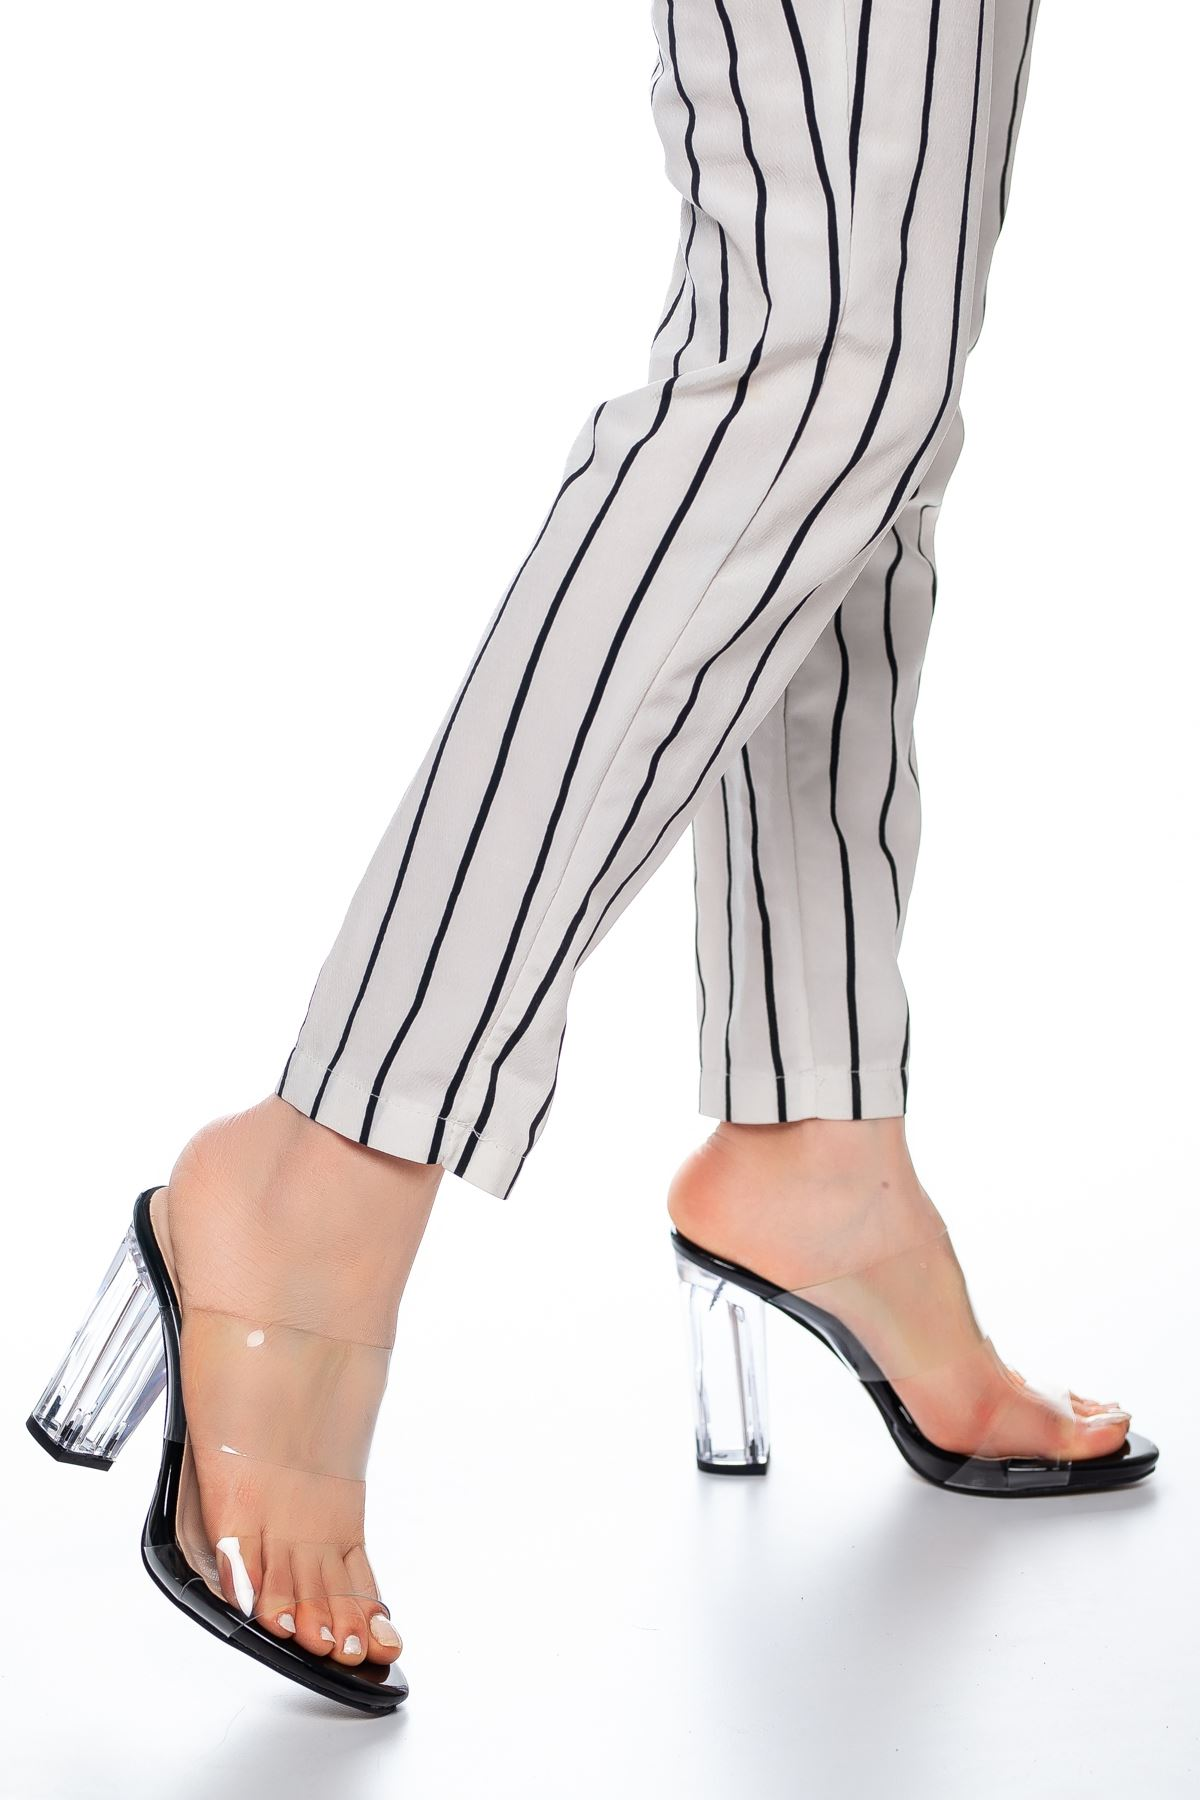 Felis Şeffaf Bantlı topuklu ayakkabı Siyah